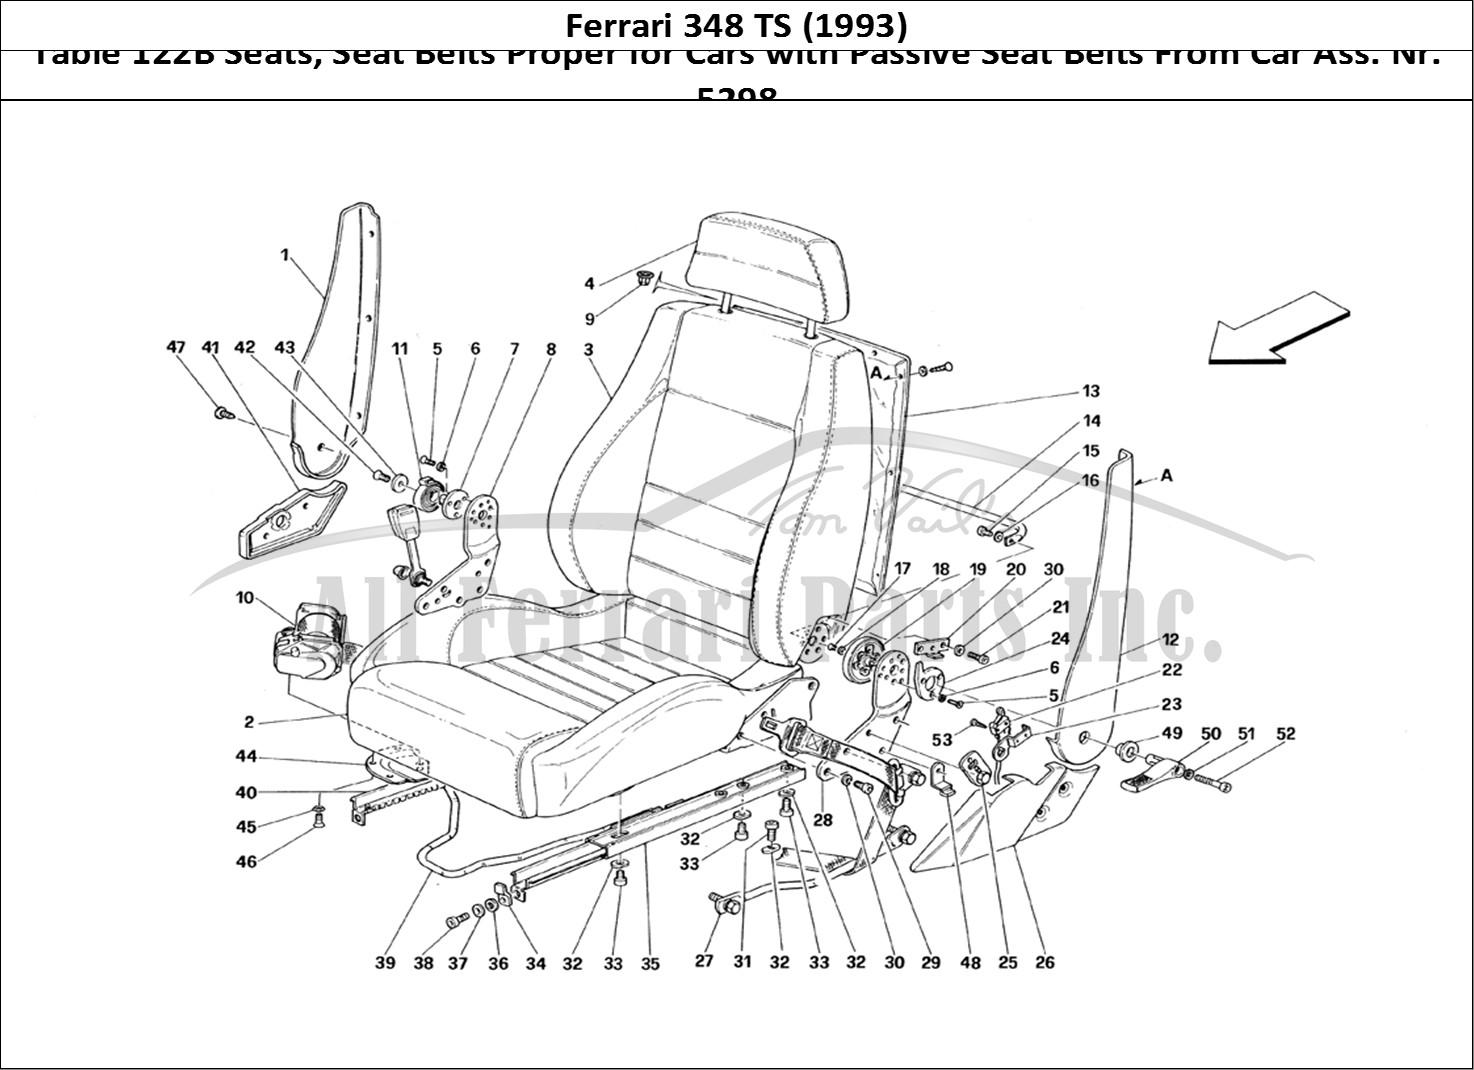 Buy Original Ferrari 348 Ts 122b Seats Seat Belts